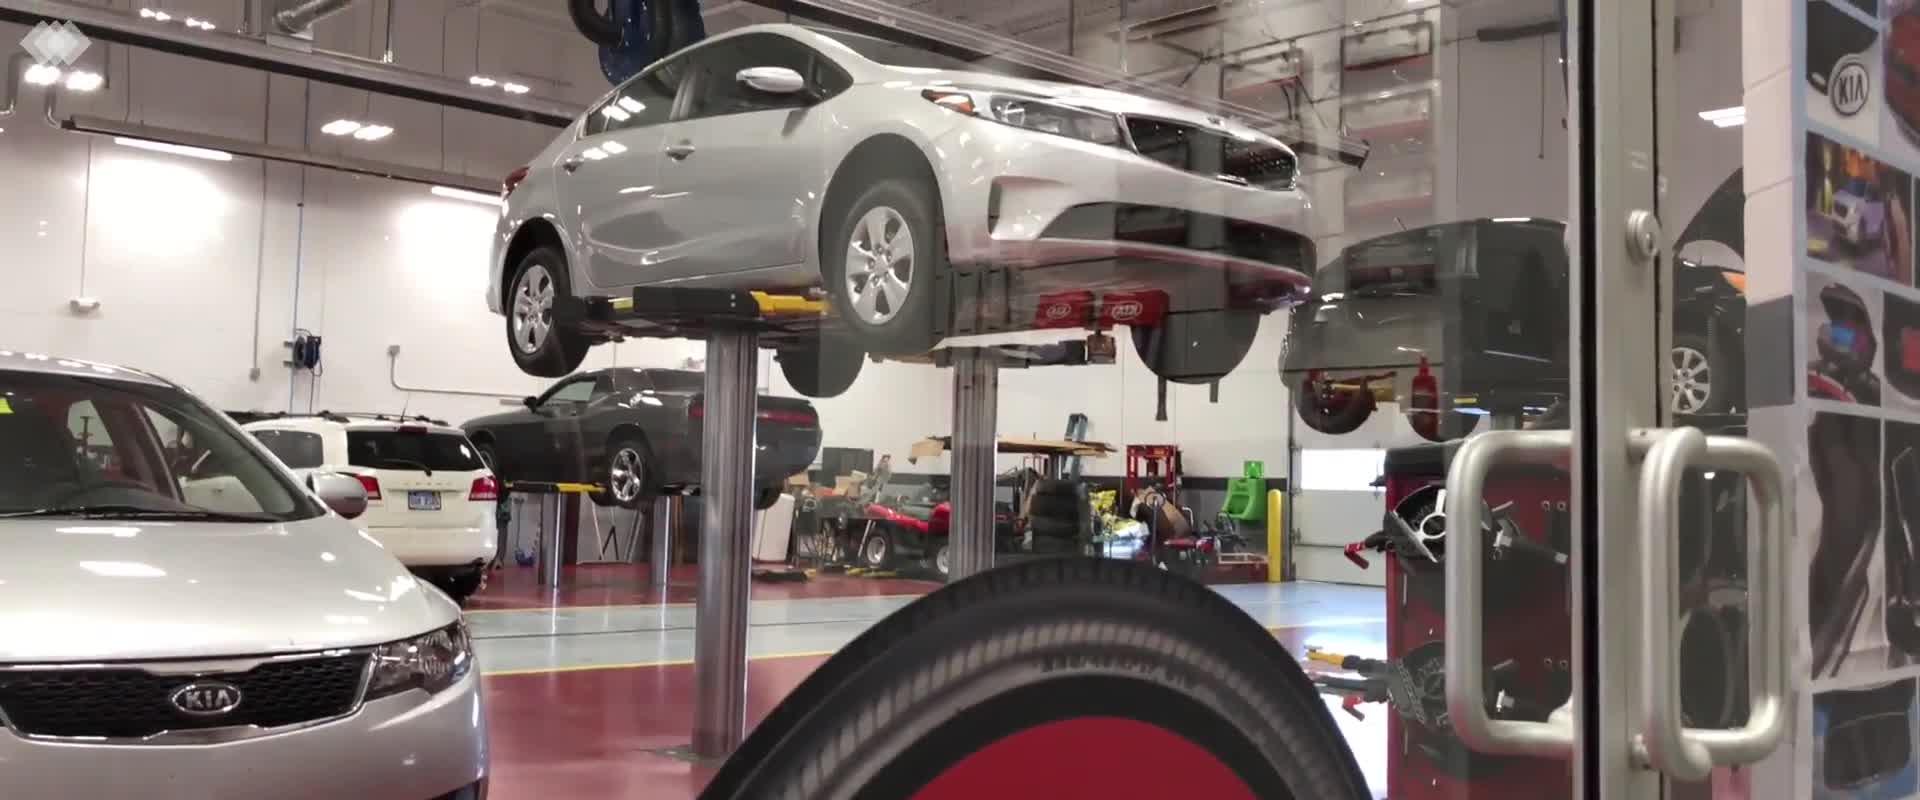 Summit Place Kia   New & Used Vehicle Sales Michigan